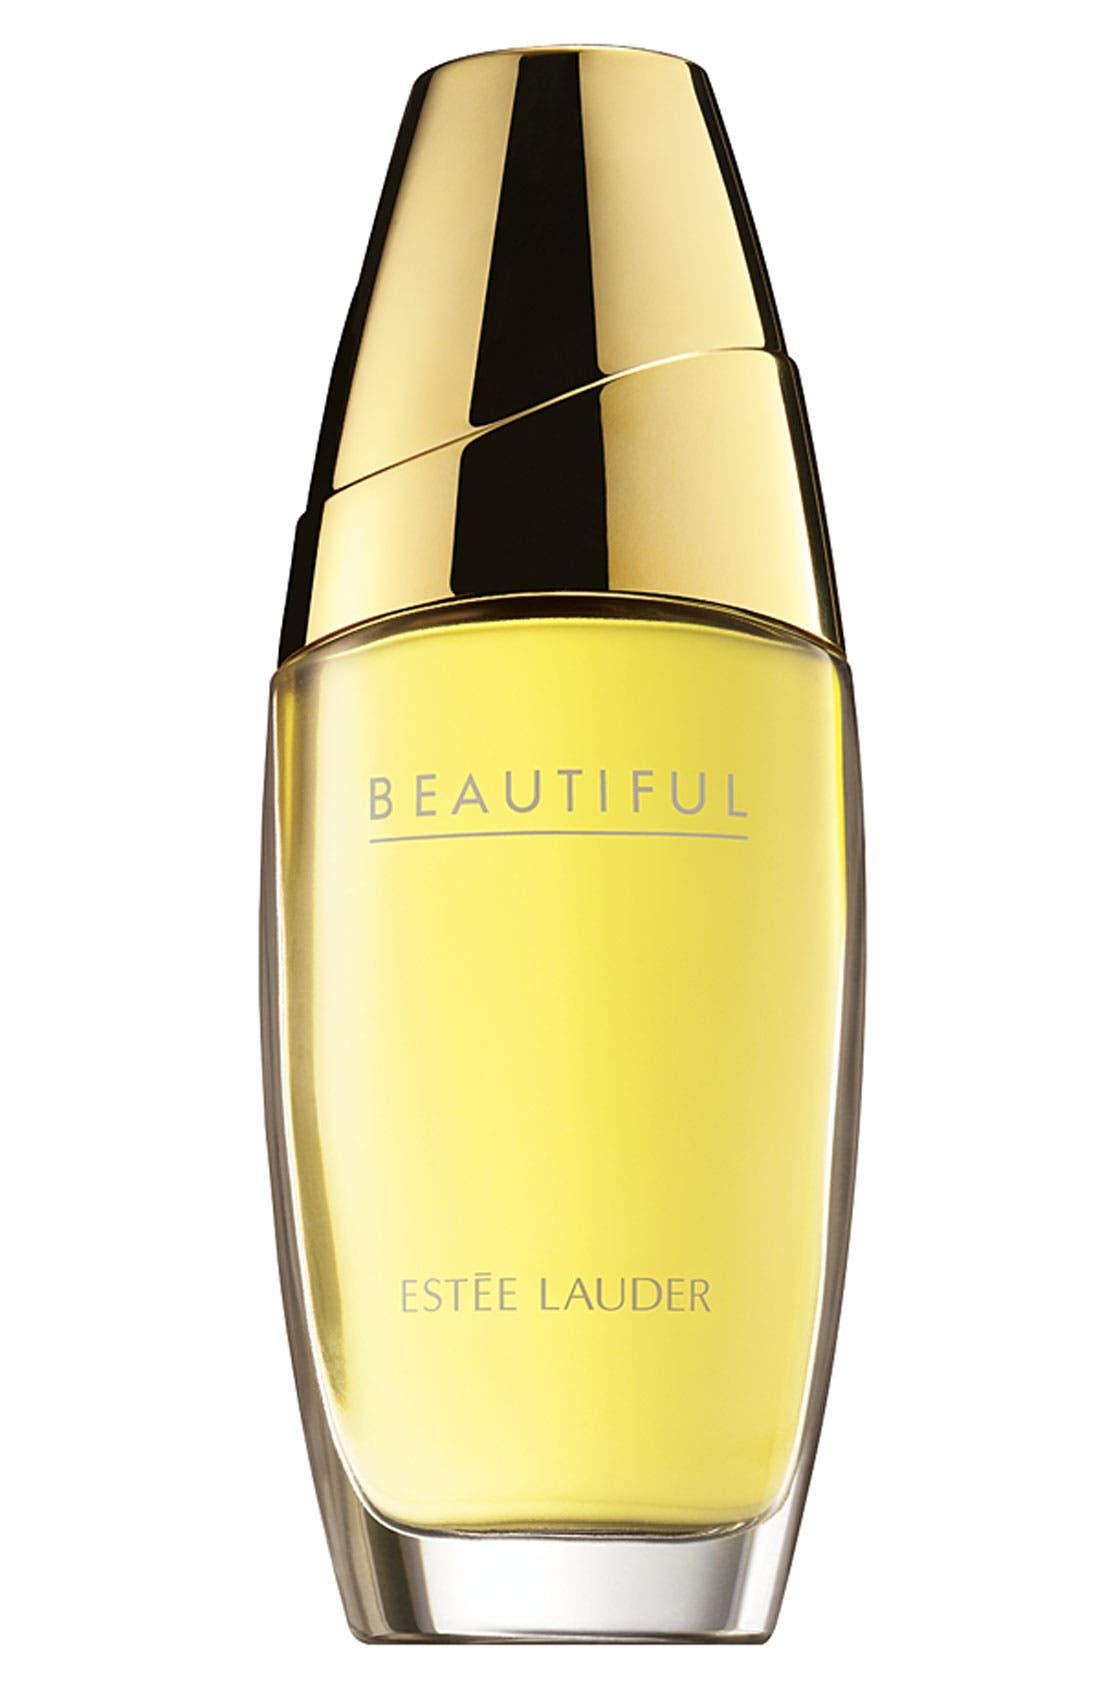 Estée Lauder 'Beautiful' Eau de Parfum Spray